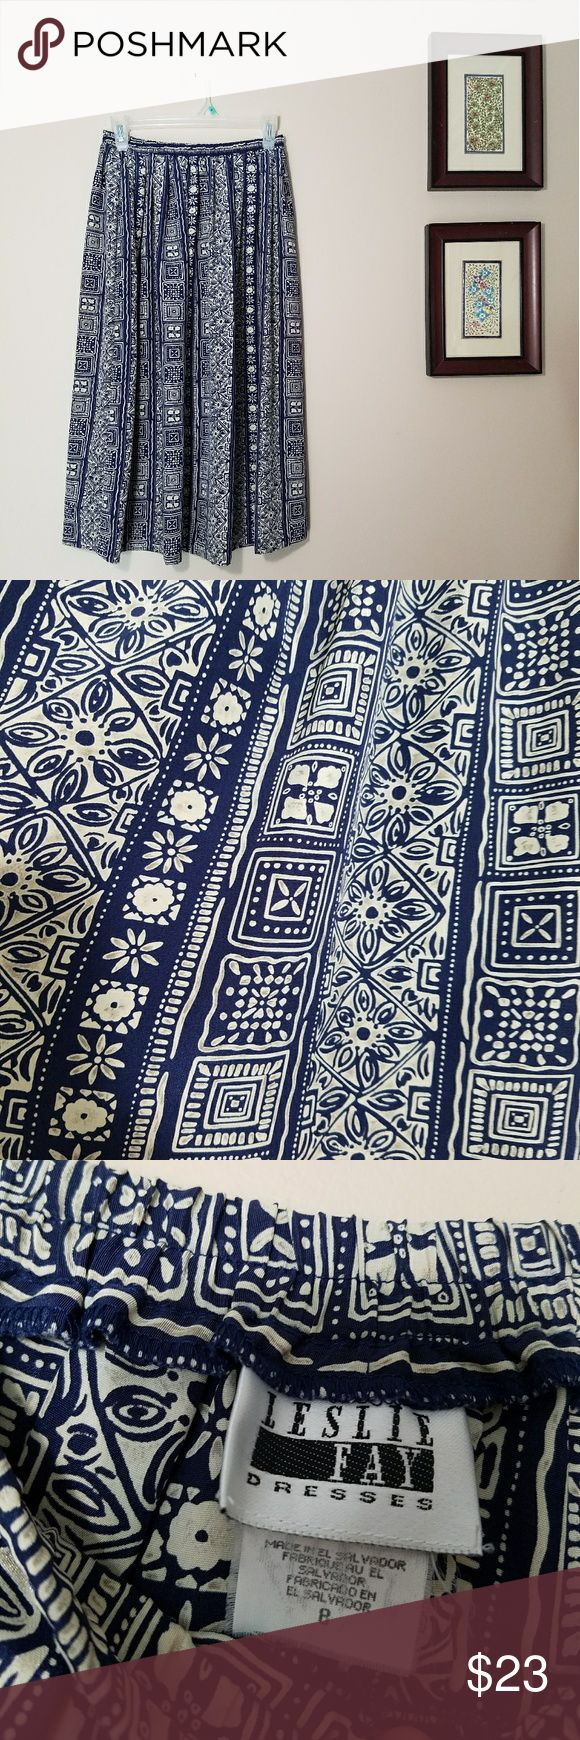 High Waisted Midi Tribal Print Skirt Leslie Fay Adorable high waisted skirt in size 8. Great flowy material and cute tribal print! Leslie Fay Skirts Midi